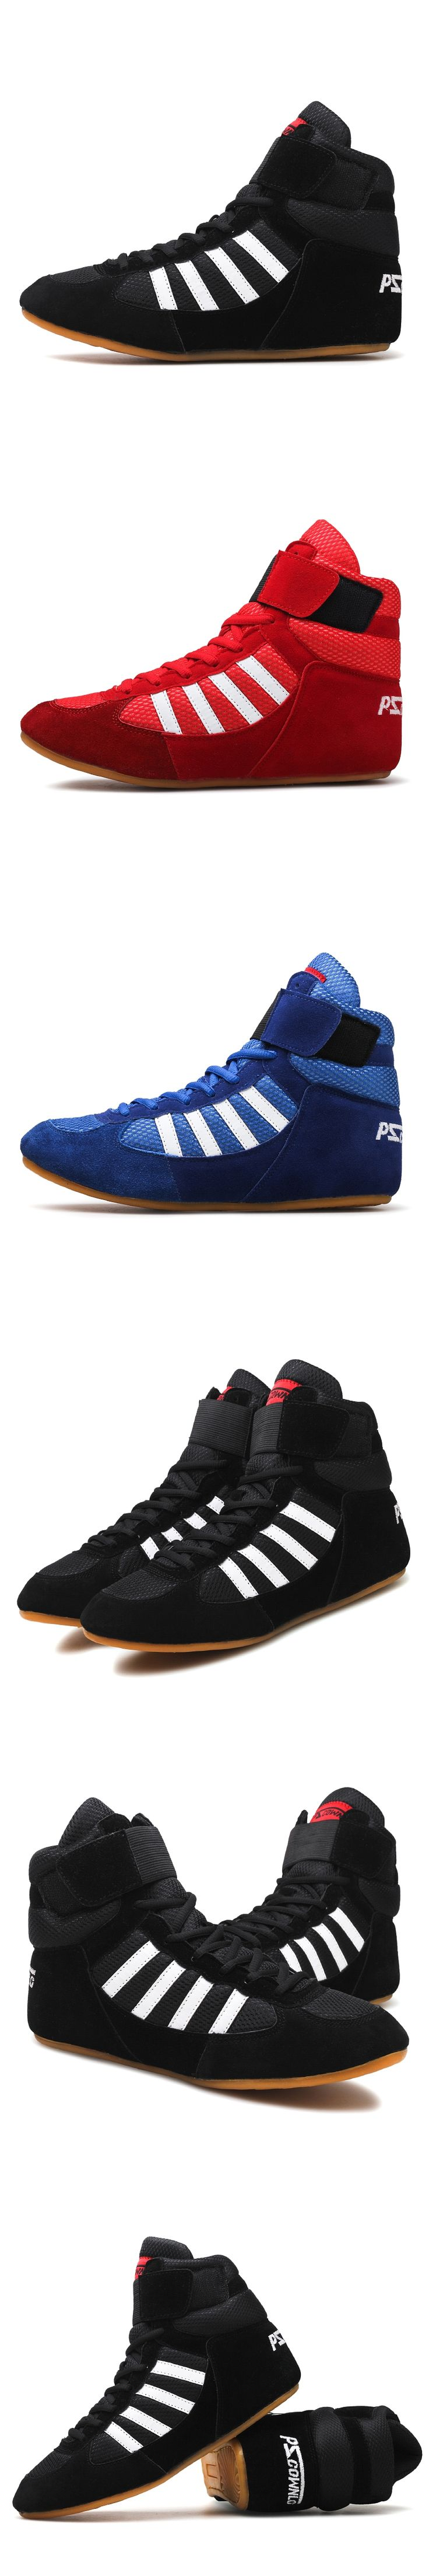 2016  wrestling shoes for men training shoes geniune leather sneakers professional boxing shoes tenis feminino de boxe shoes